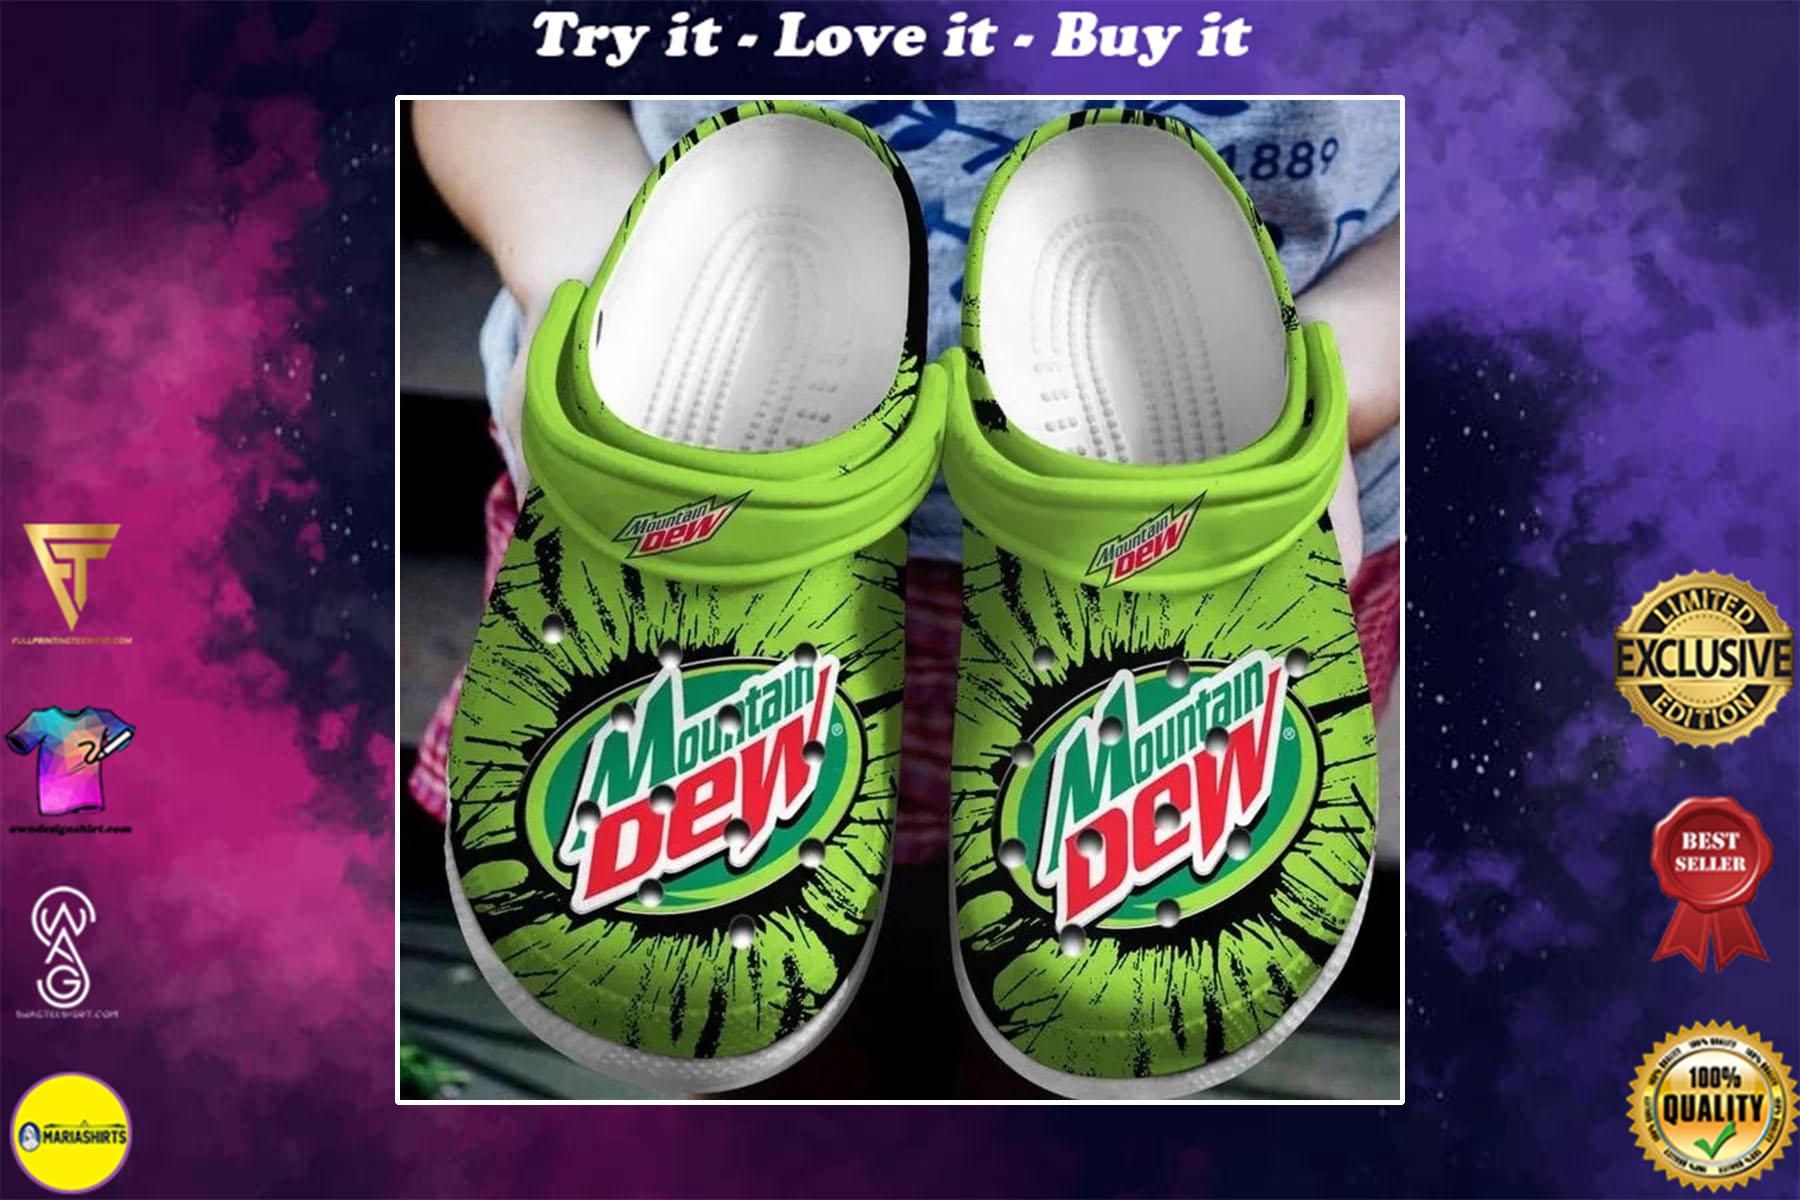 [special edition] pepsico mountain dew crocs shoes - maria